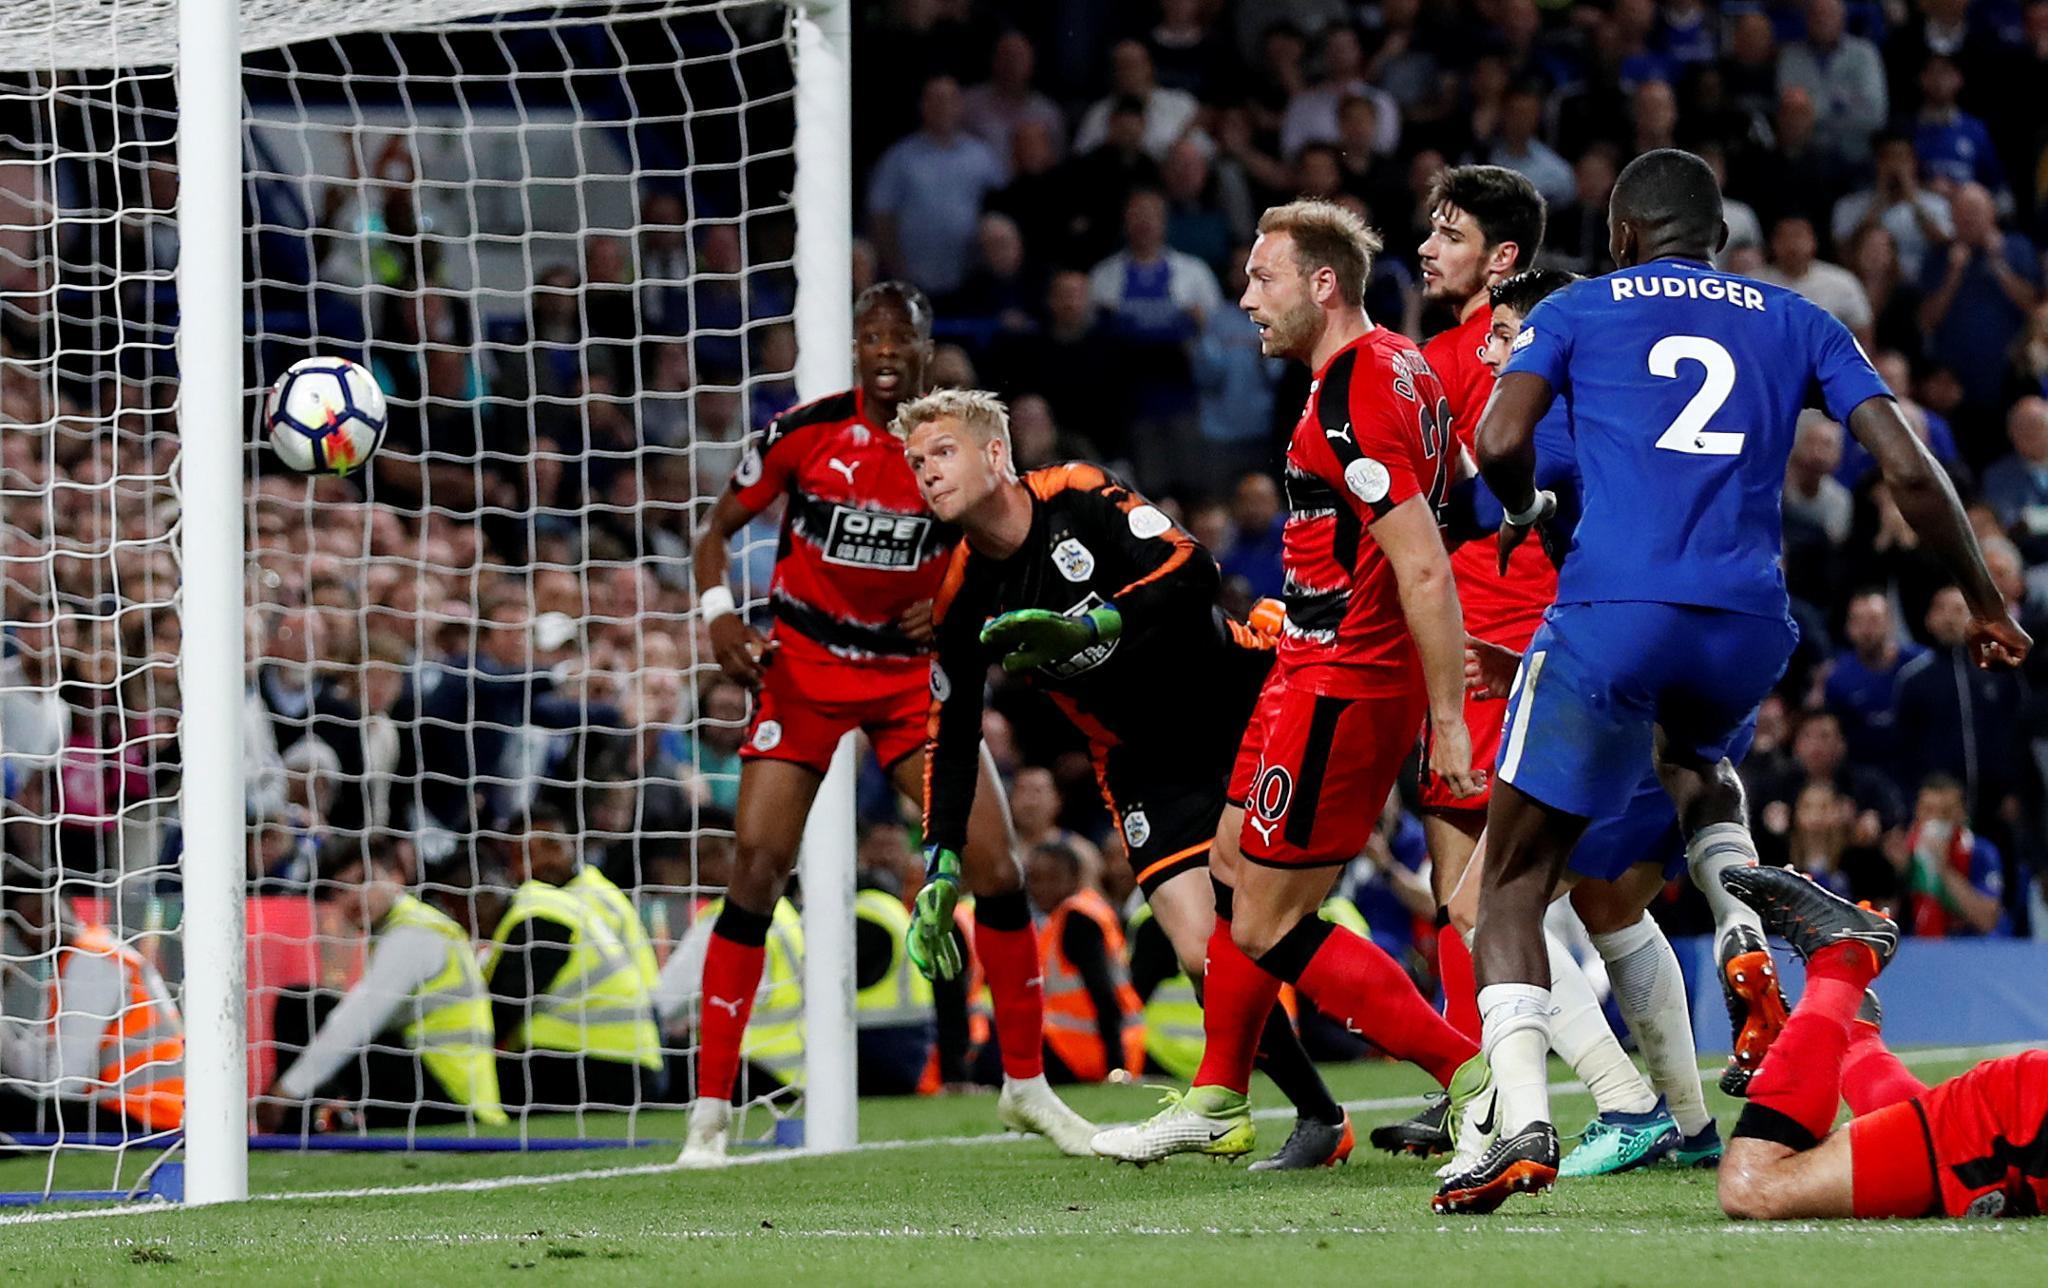 FA Fine Chelsea £20k For Players Misconduct Vs Huddersfield